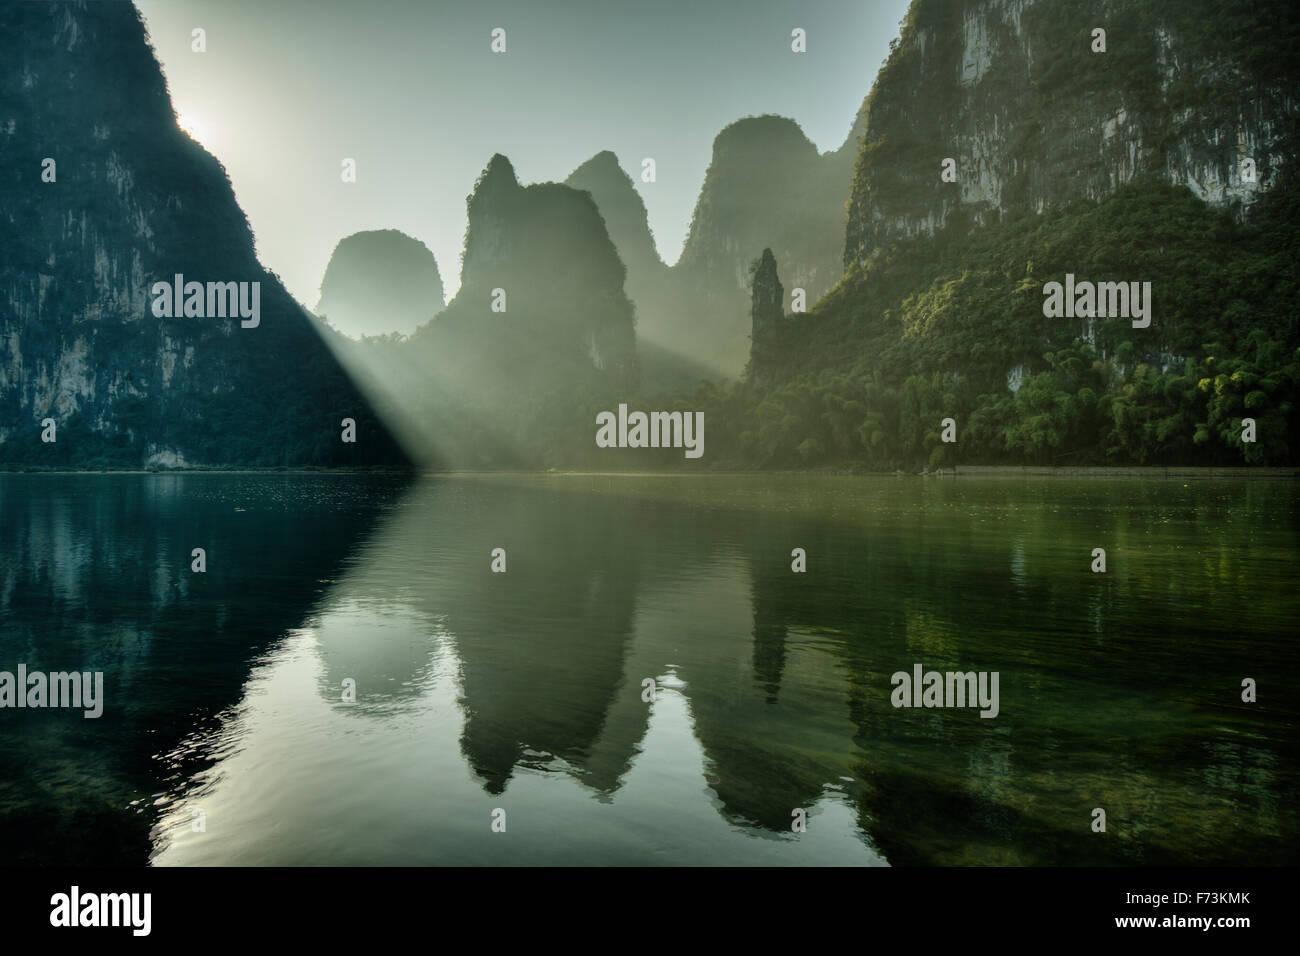 Limestone Karst Formations reflected in River Li Guilin Region Guangxi, China LA007958 Stock Photo